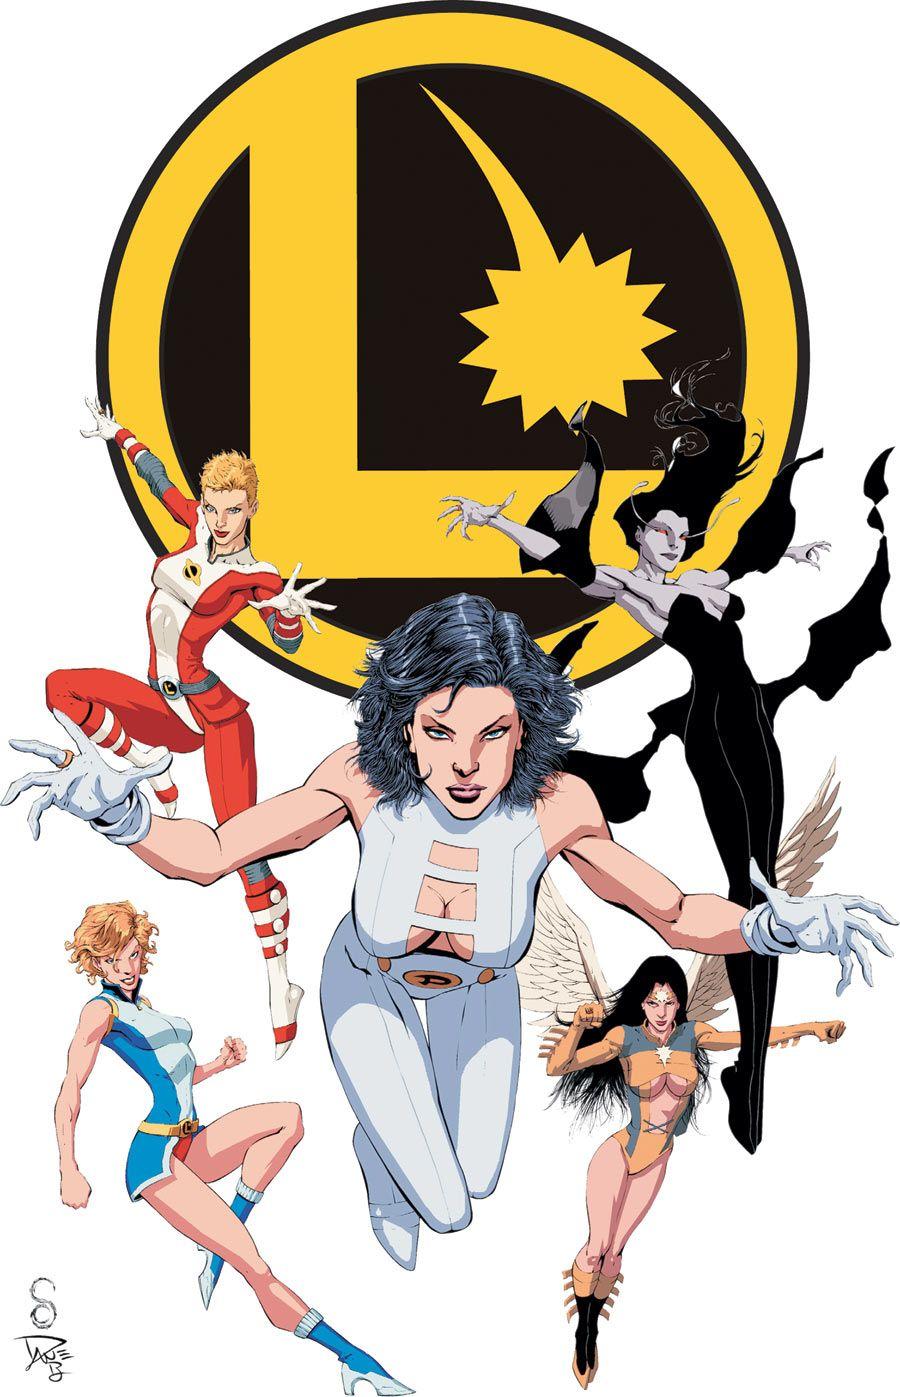 DC COMICS: I SIMBOLI DEGLI EROI (PARTE 1) - Comix Factory